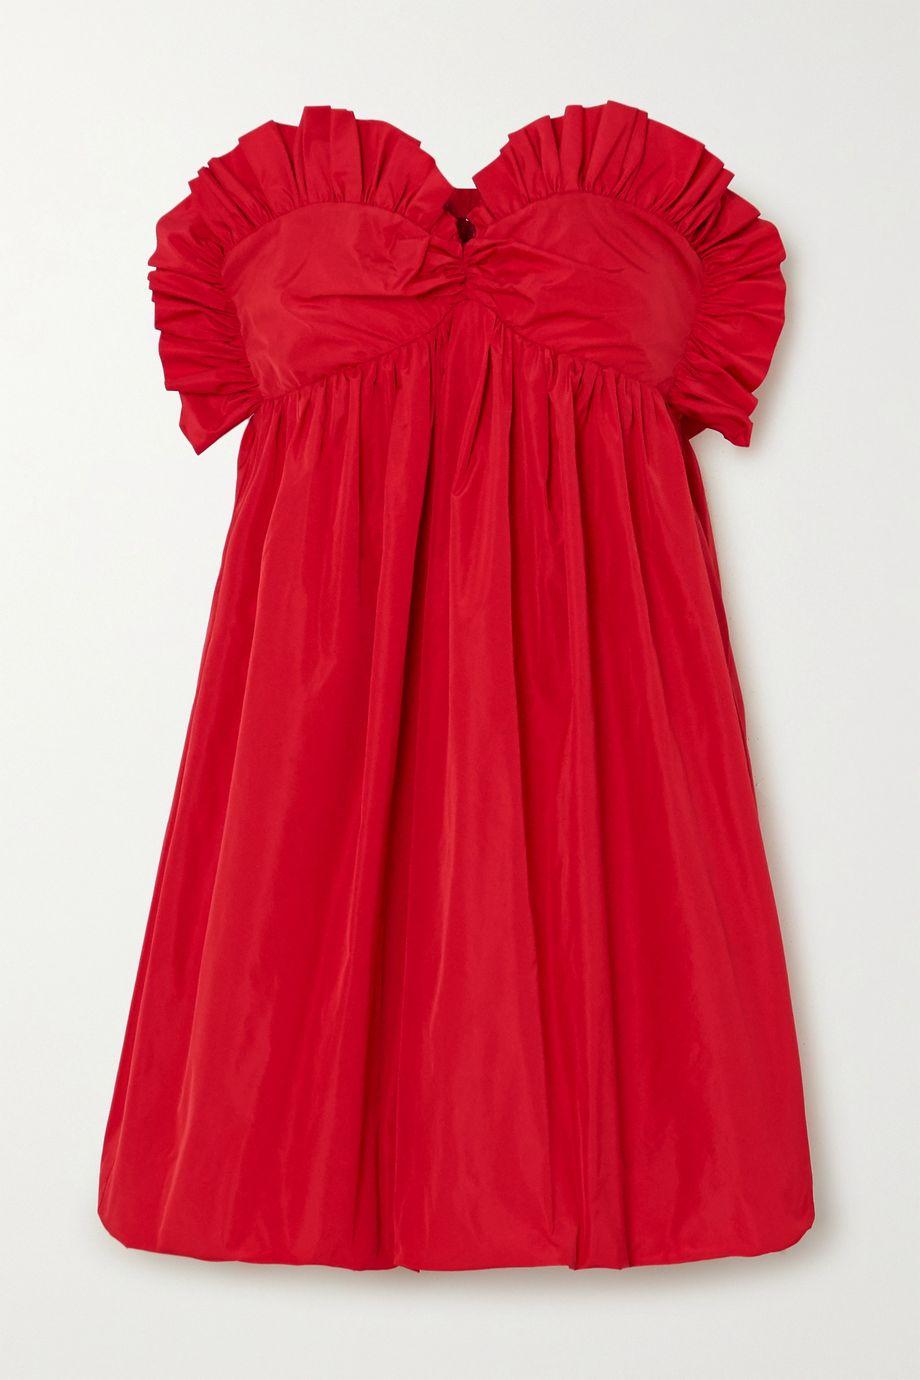 Philosophy di Lorenzo Serafini Strapless ruched taffeta mini dress